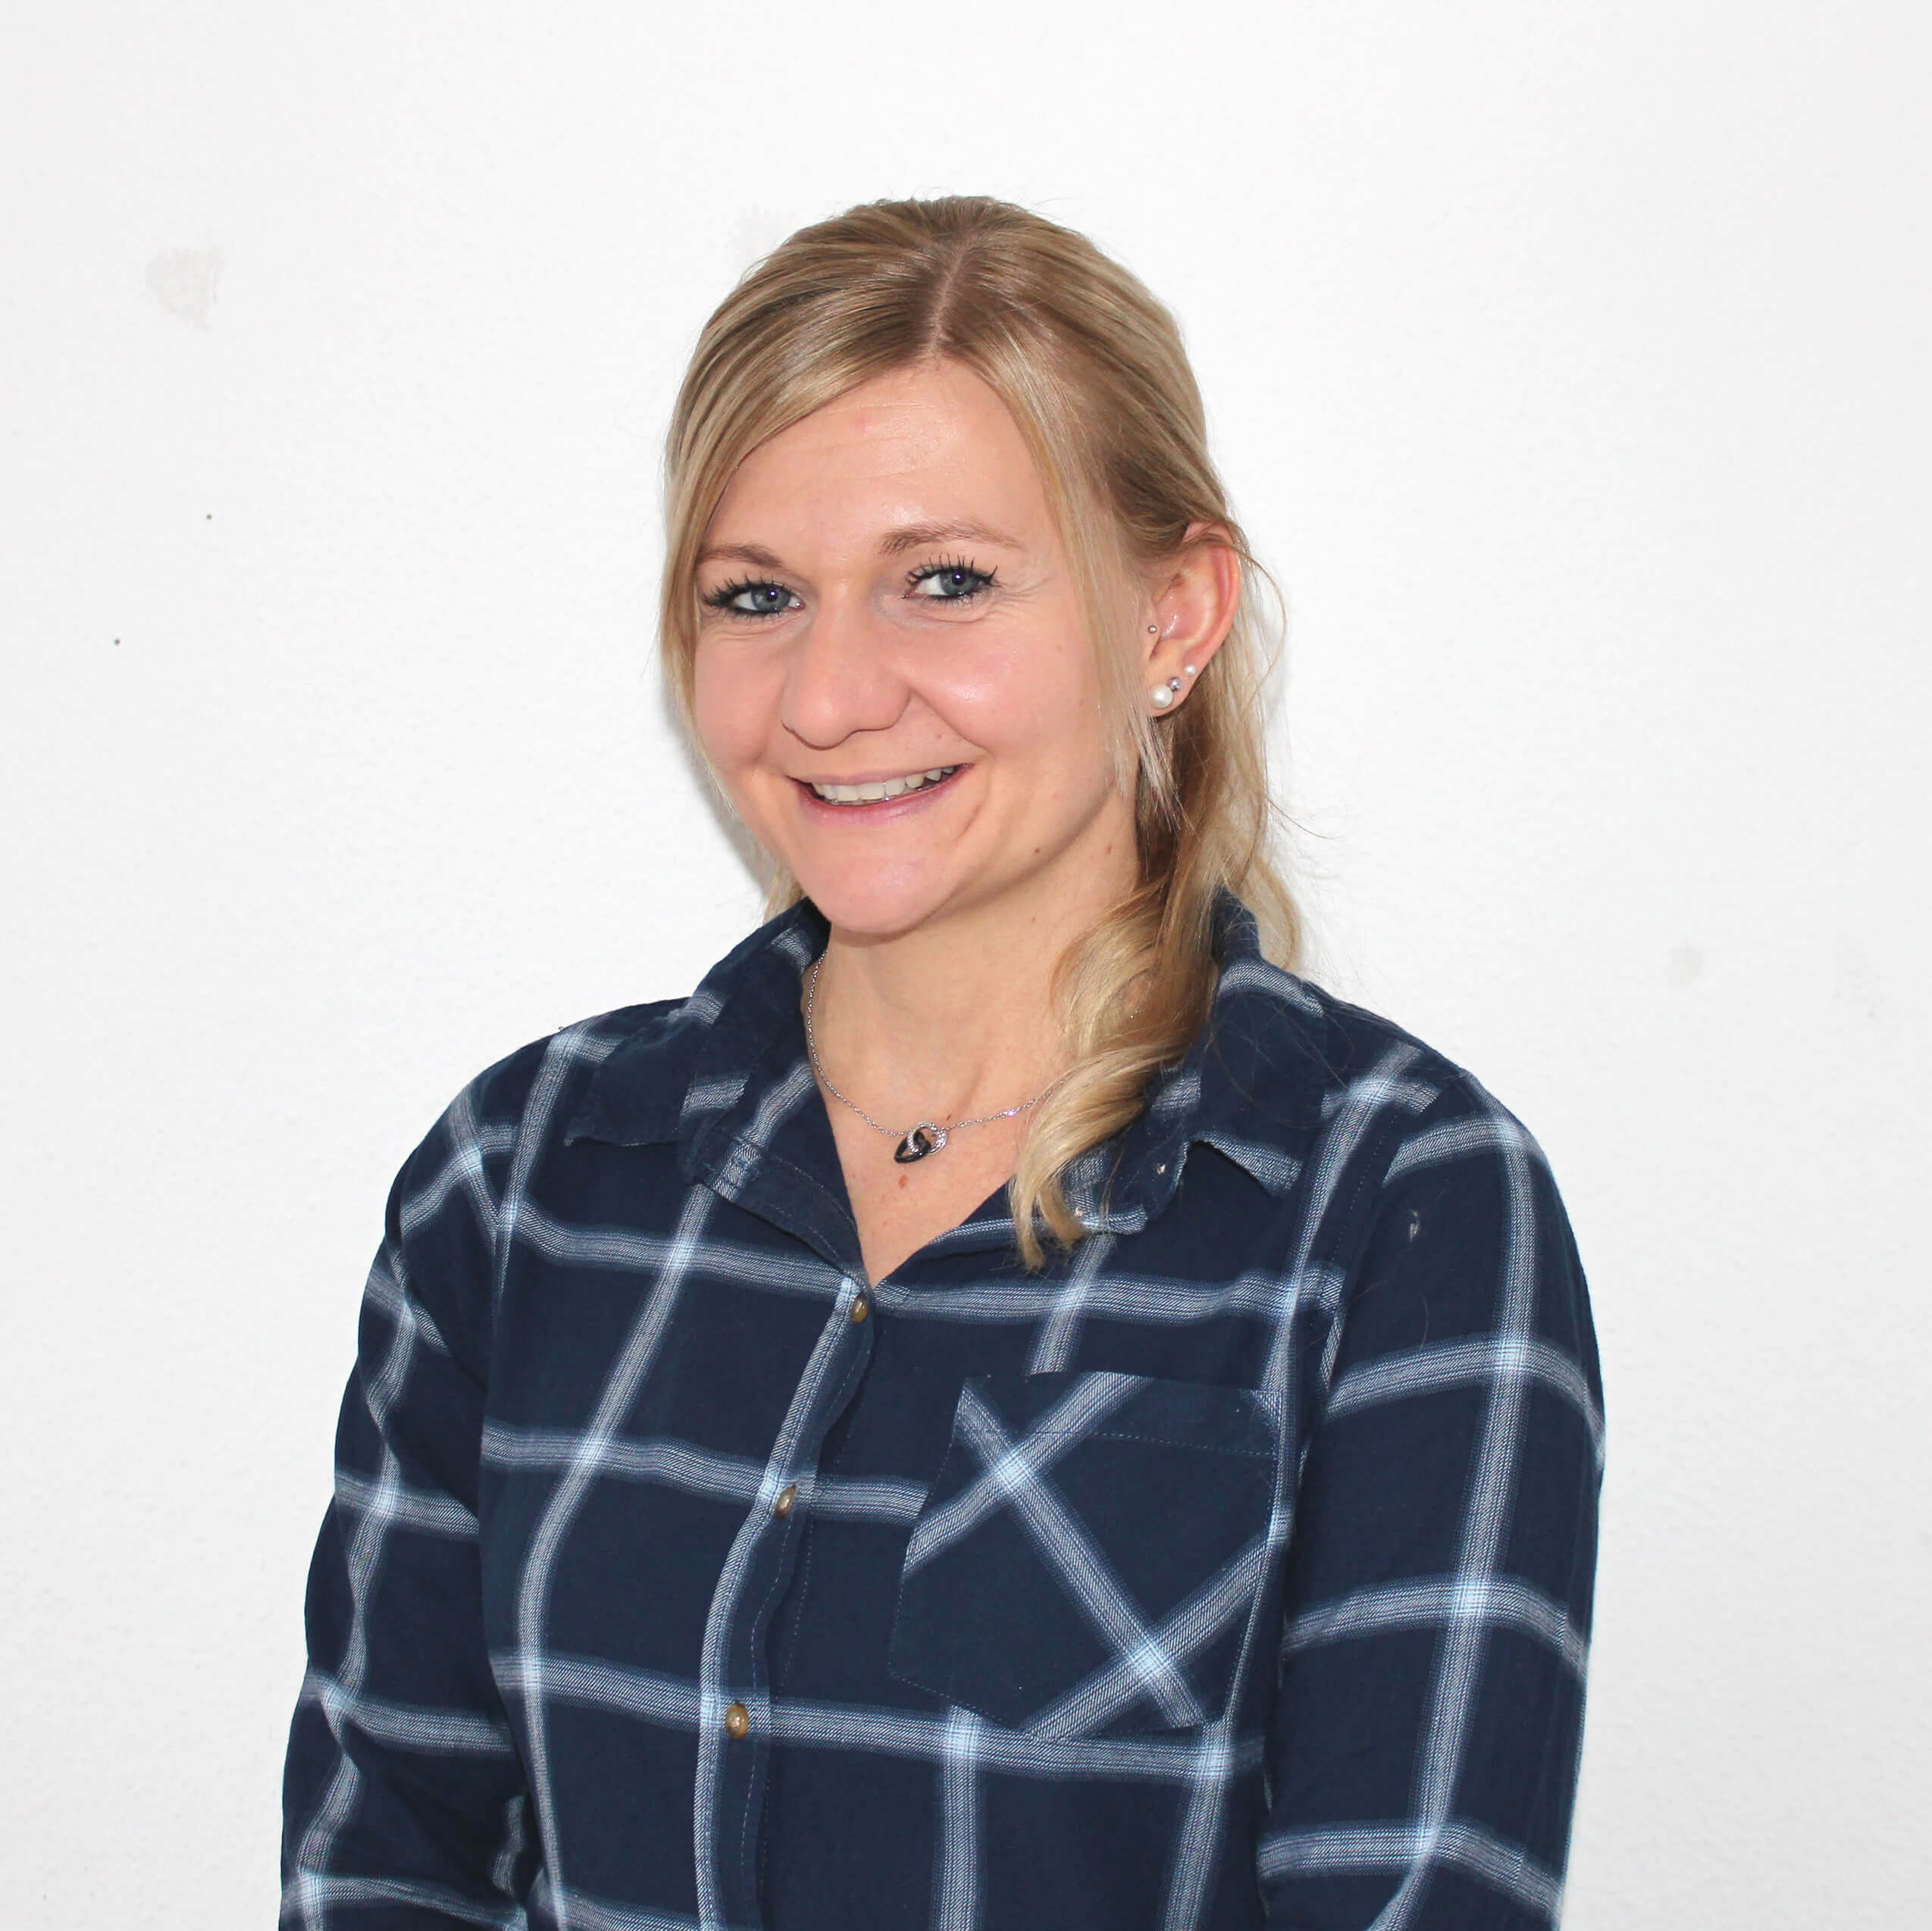 https://www.haar-werk.ch/wp-content/uploads/2021/01/Anina-Boeni-2.jpg